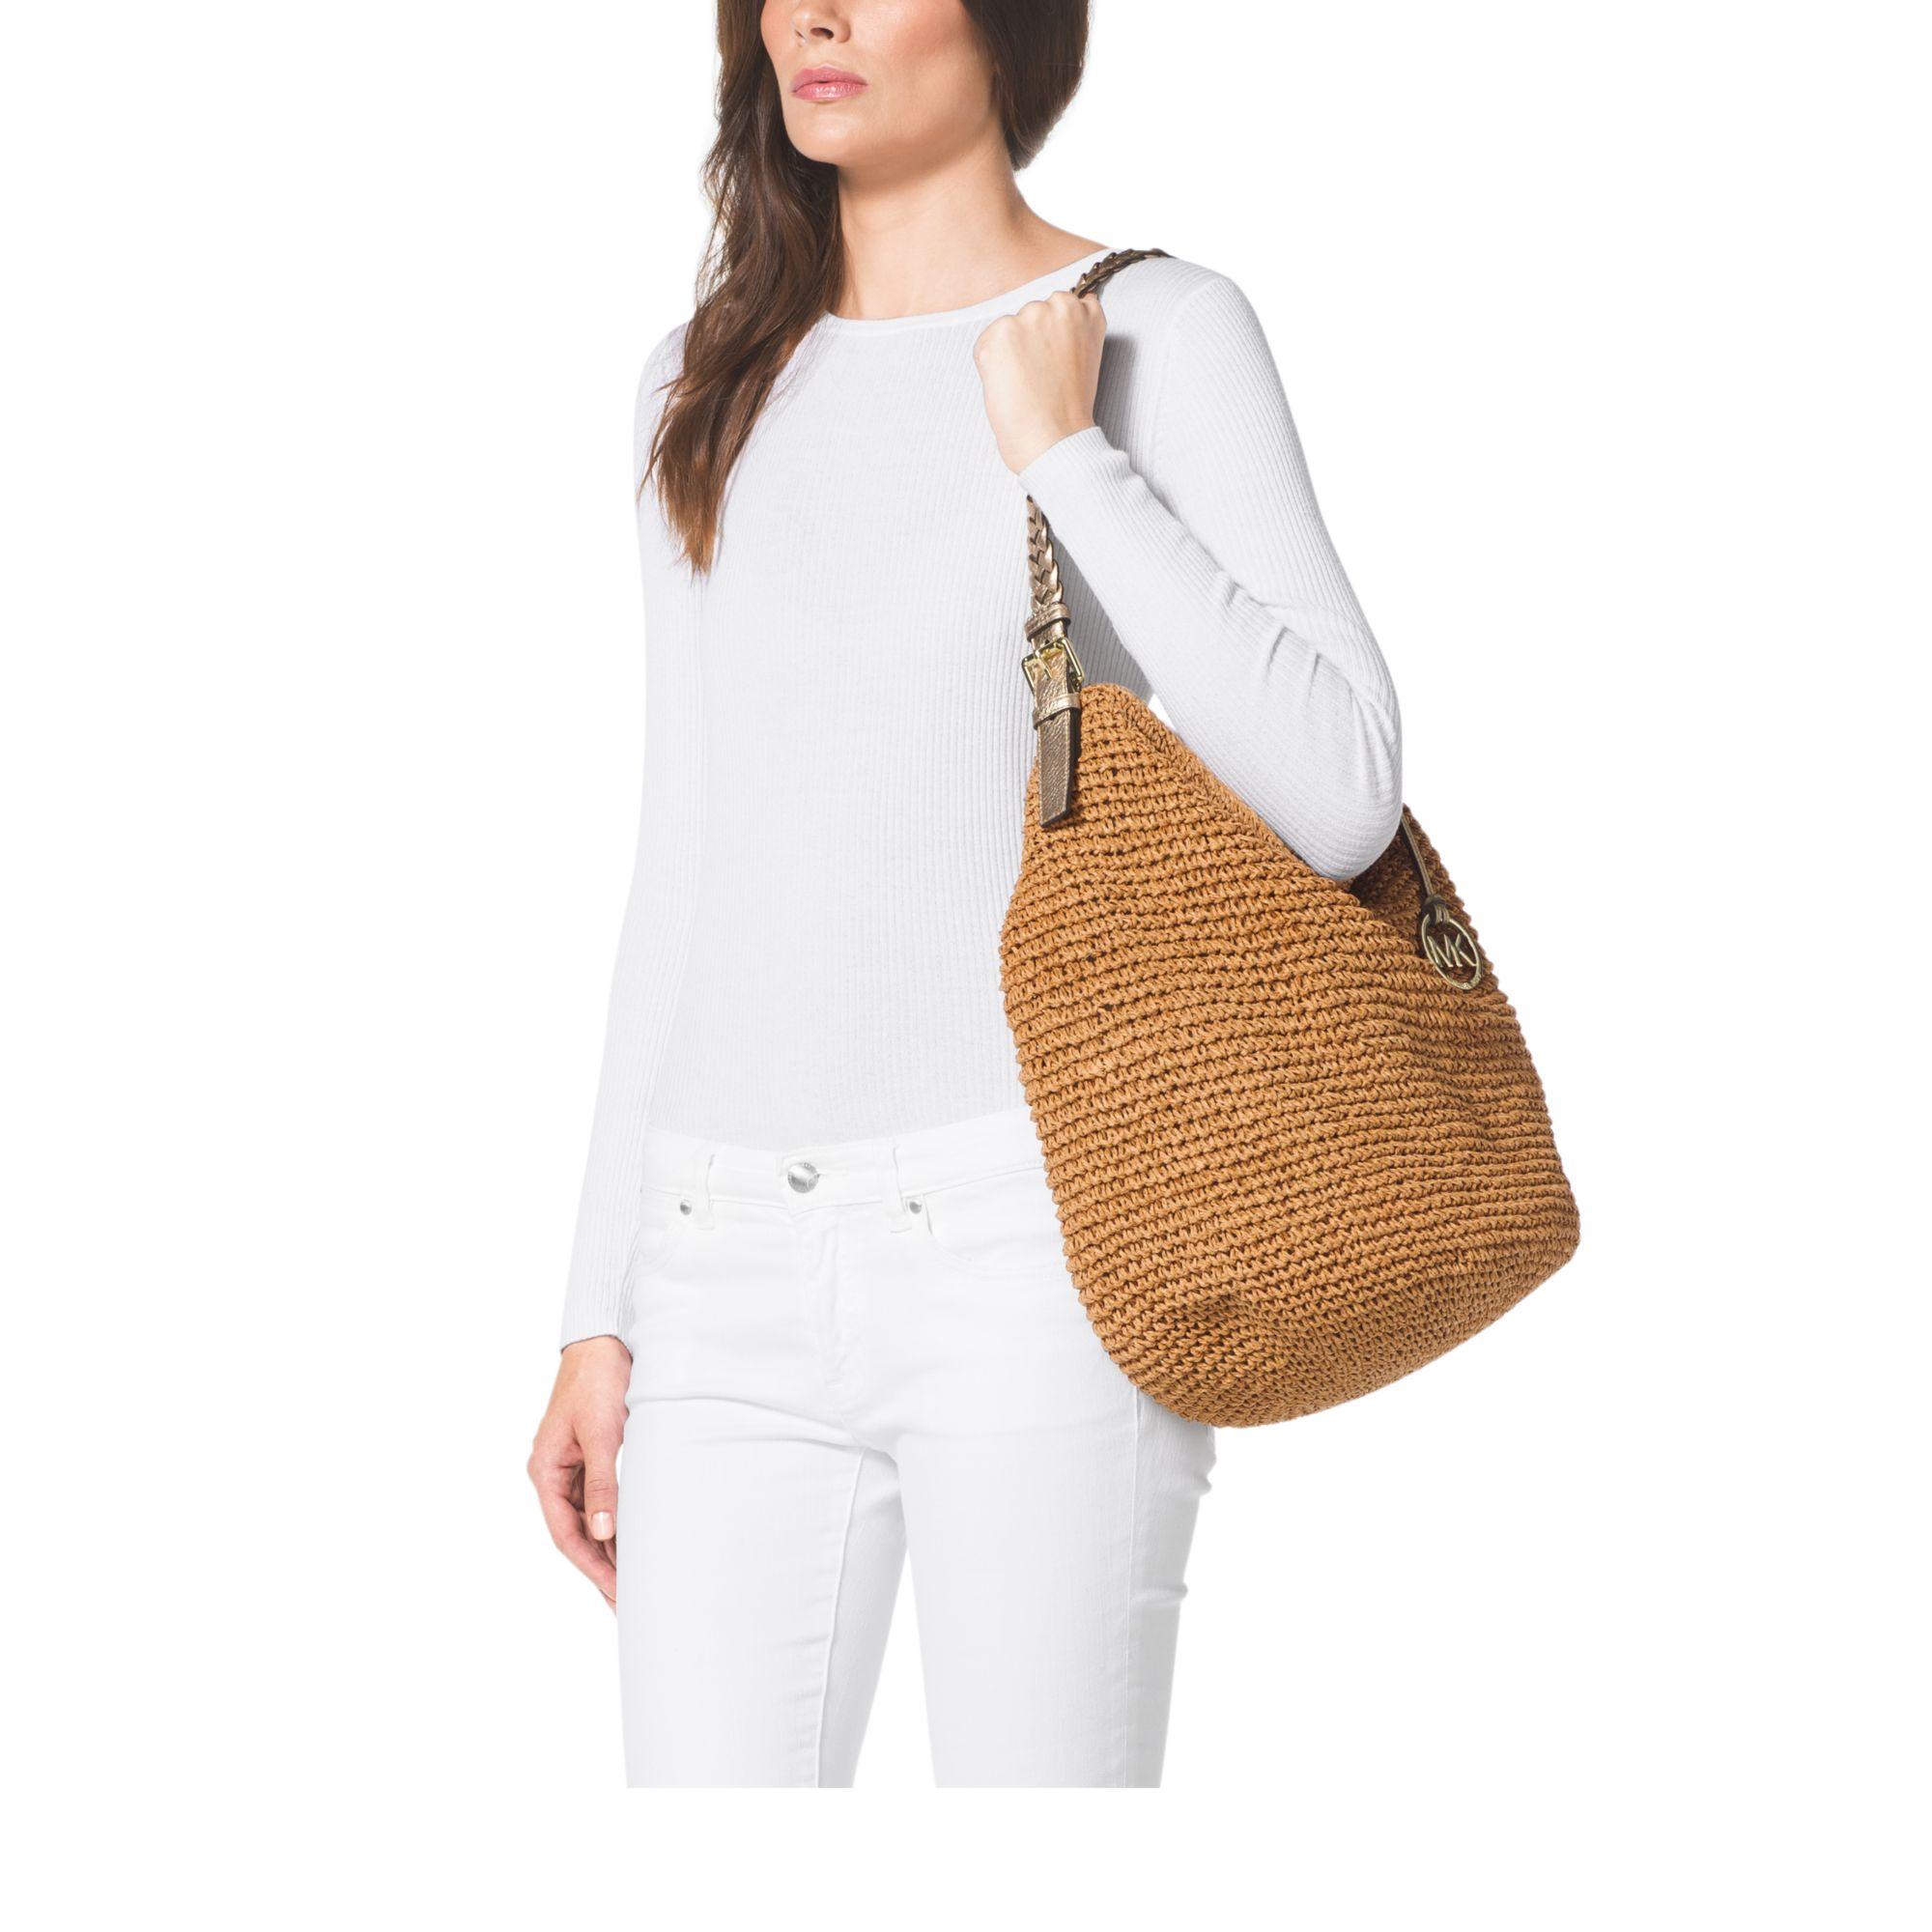 92b3fb4aa5e7 ... cheapest lyst michael kors lola large raffia shoulder bag in brown  b3258 0b0b1